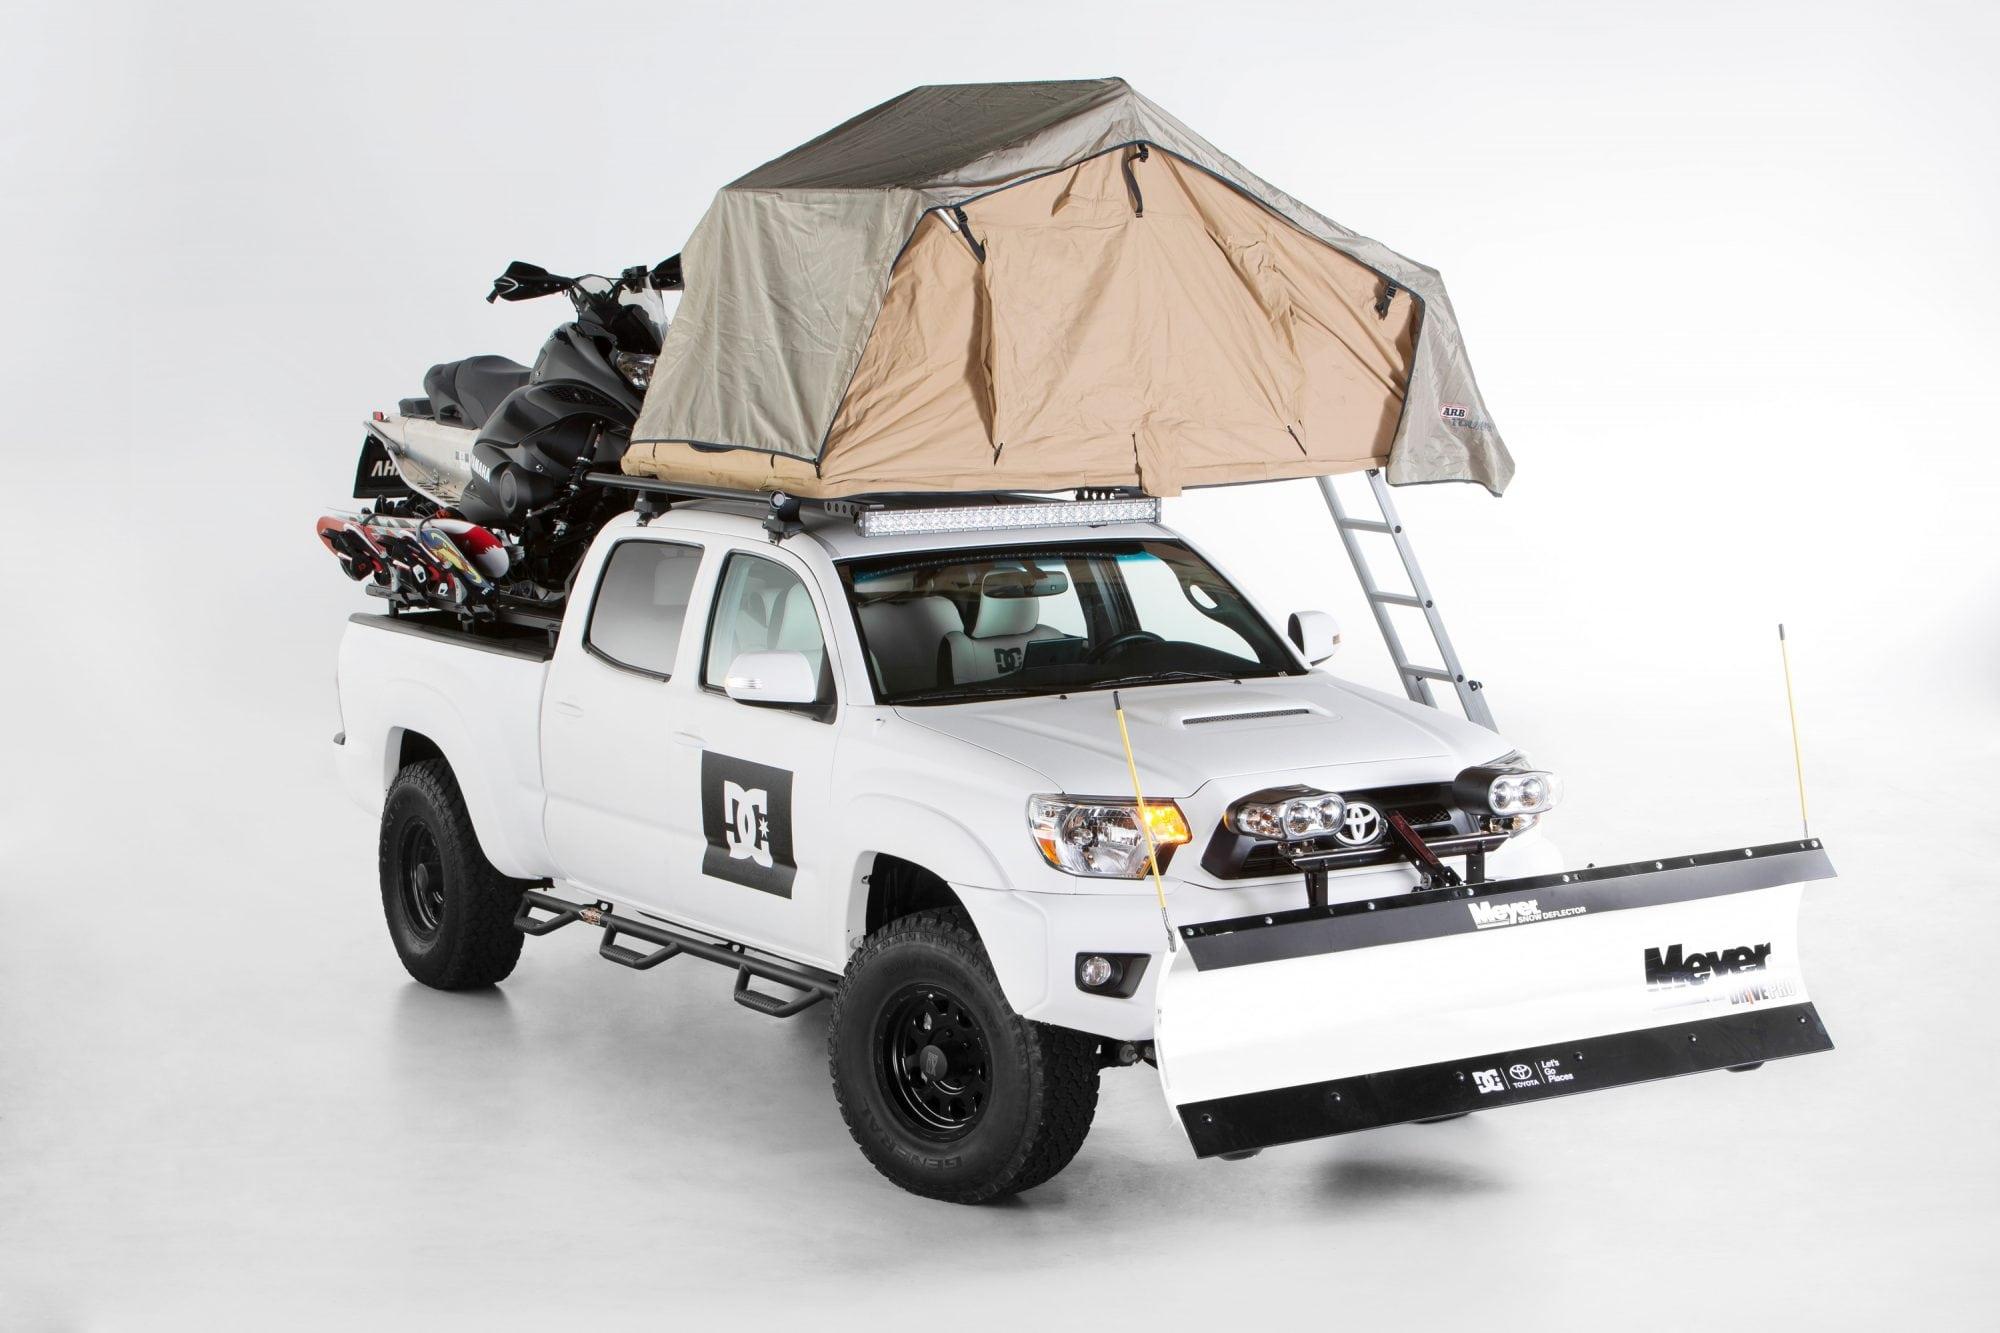 Fans gear up for the 2014 SEMA Car Show in Las Vegas  CarNewsCafecom